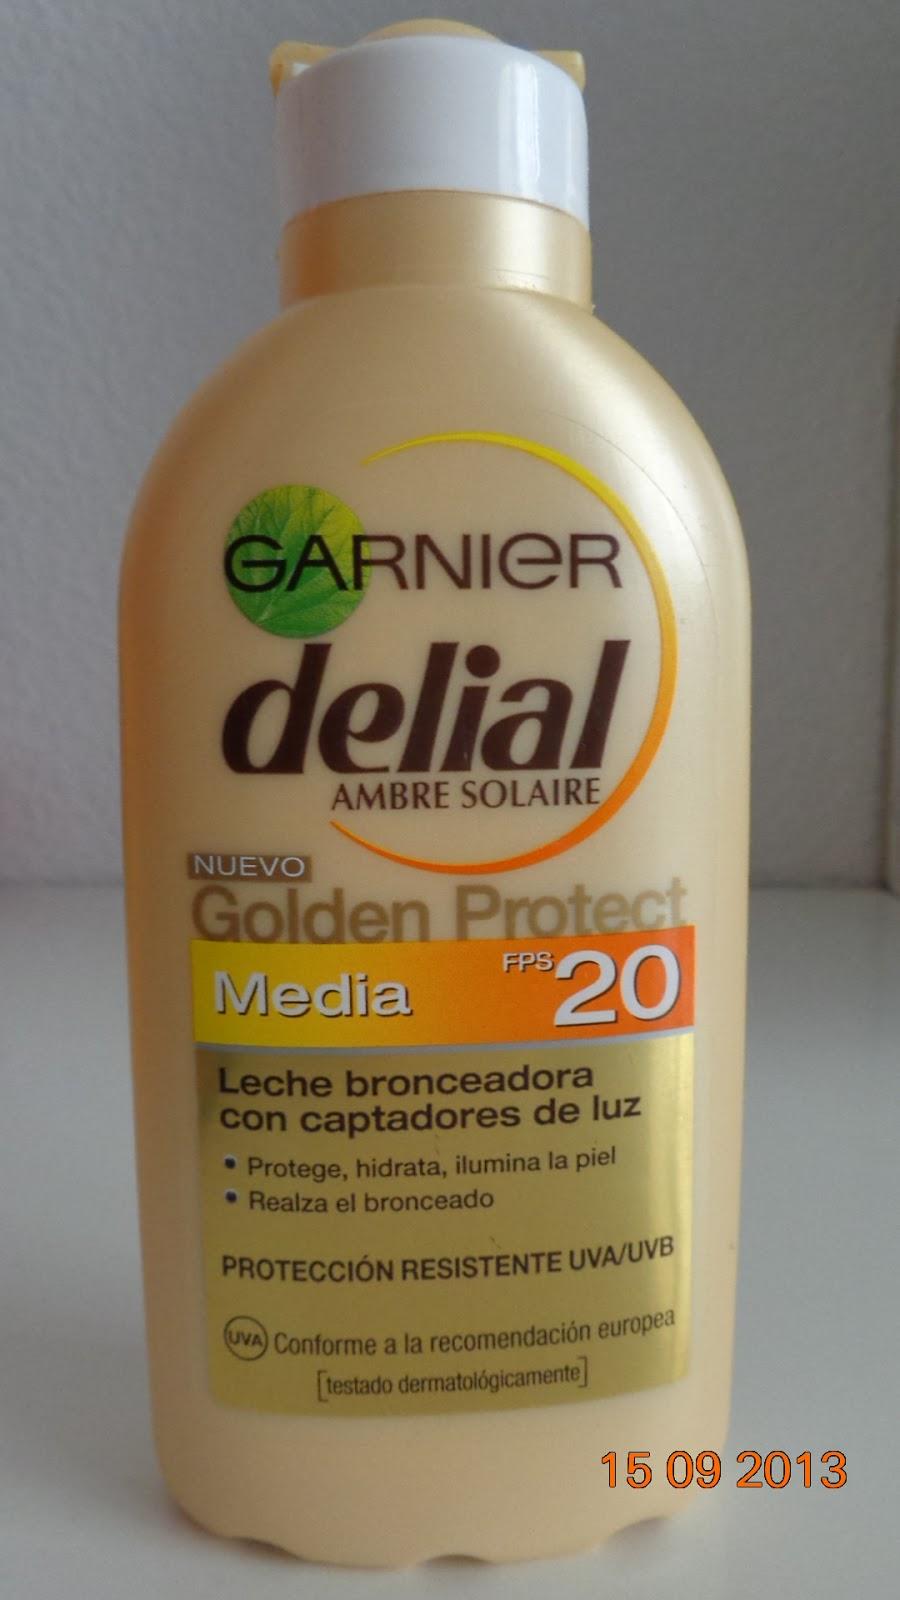 Garnier Delial Ambre Solaire Golden Protect SPF20